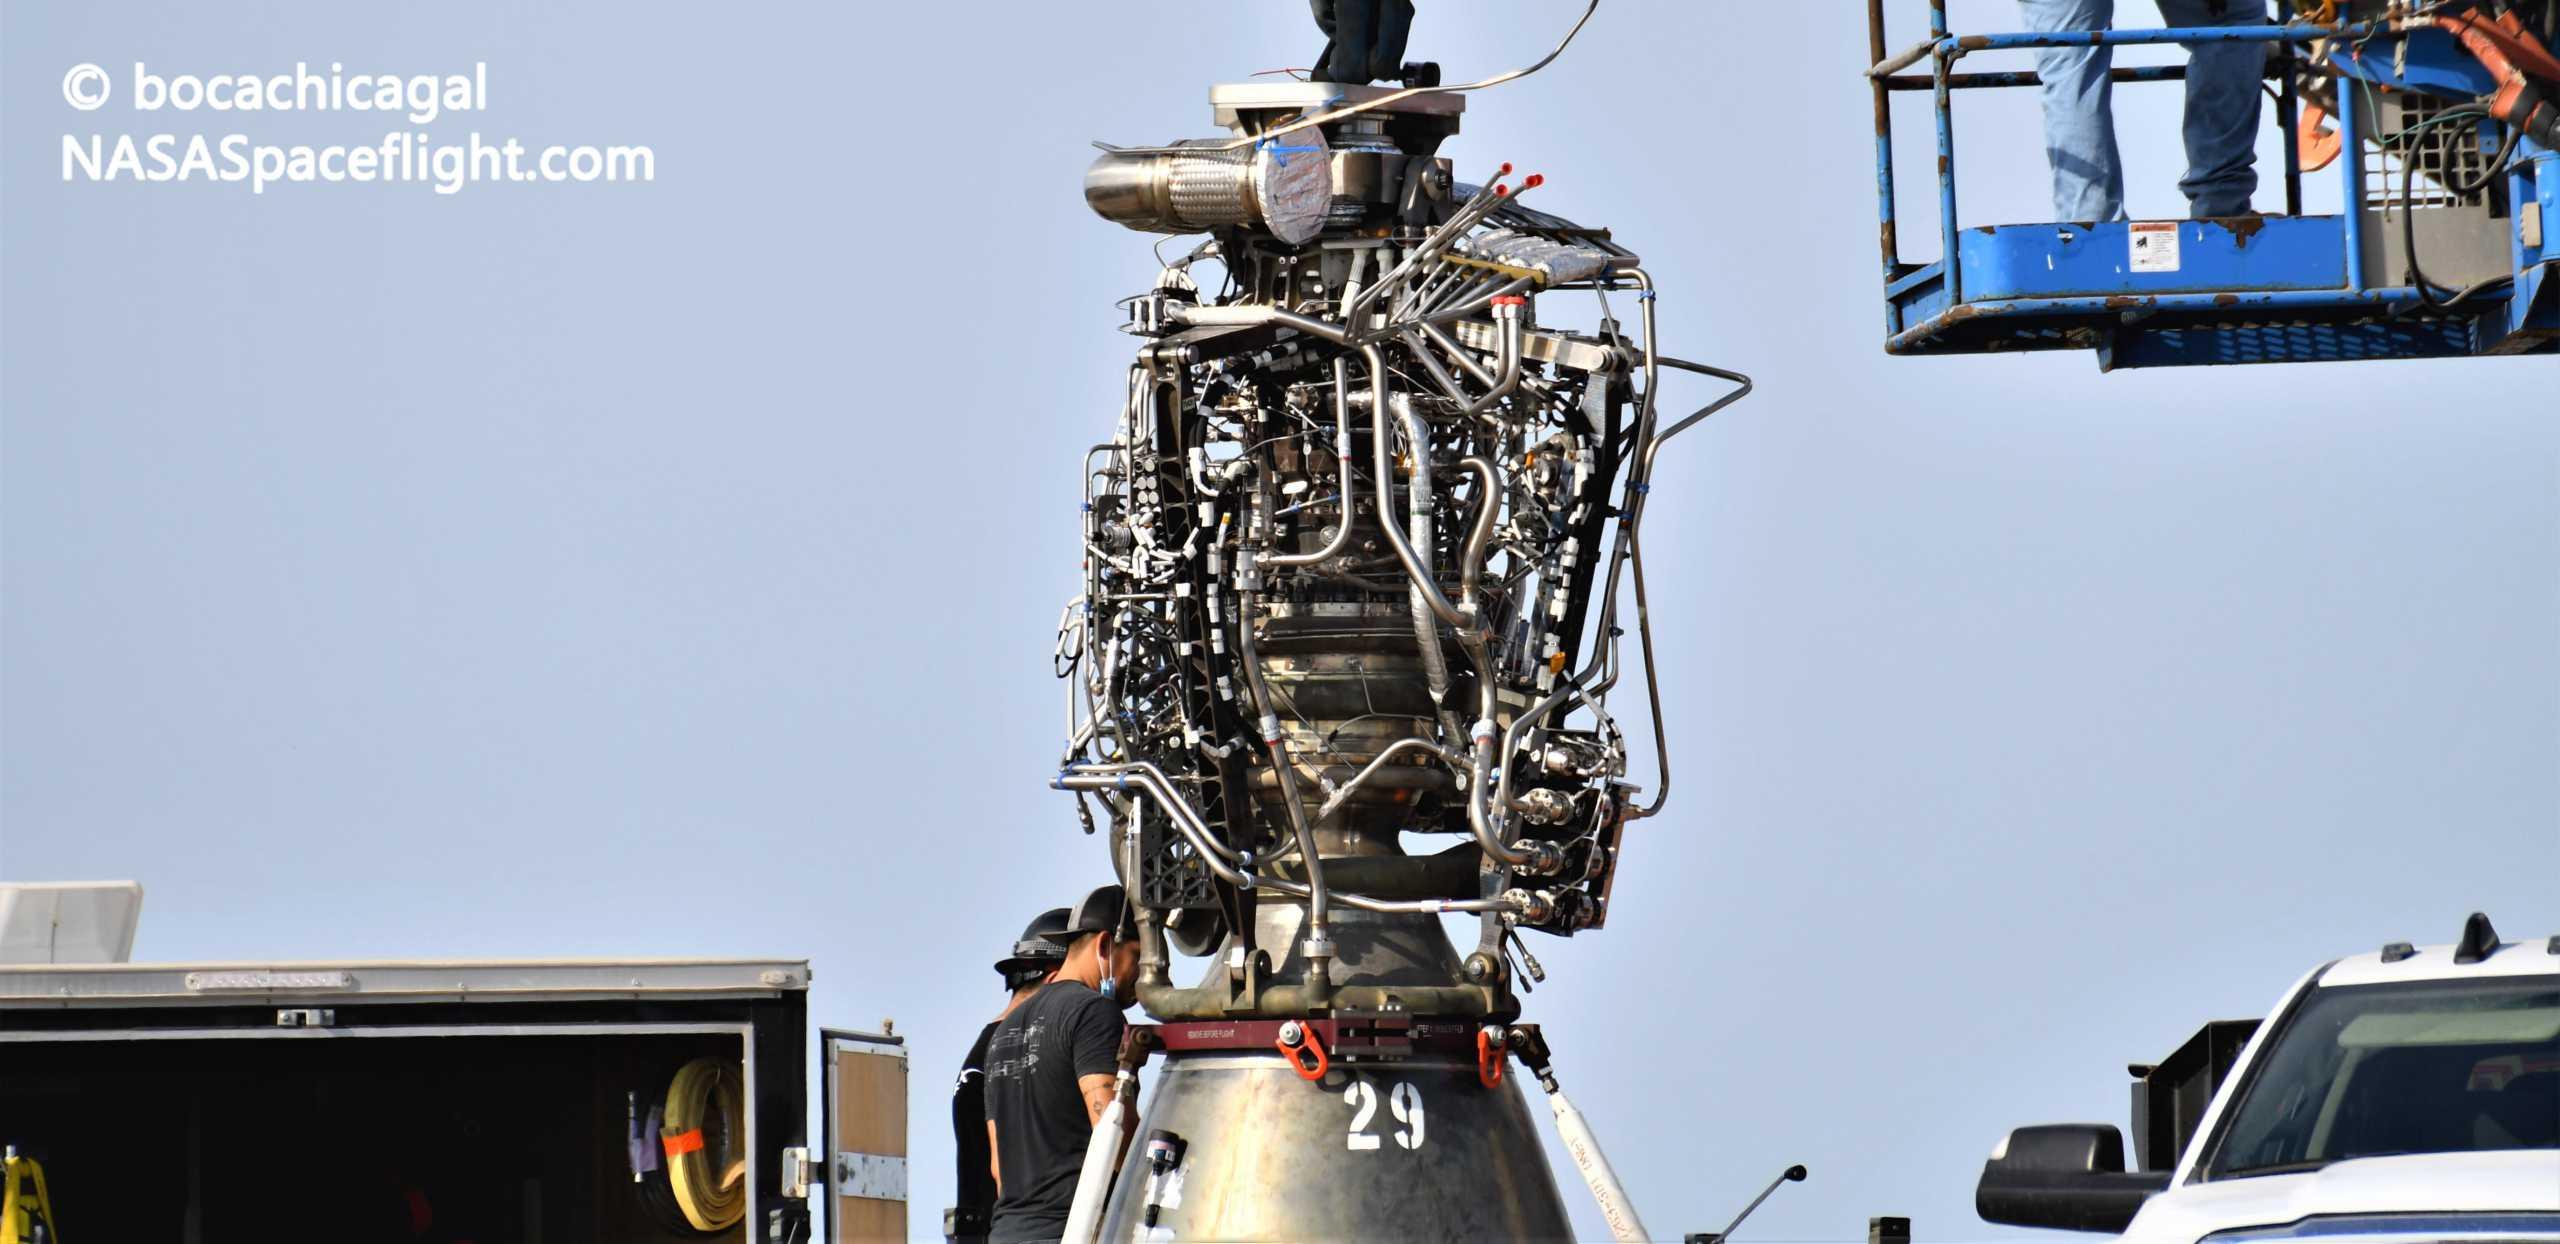 Starship Boca Chica 081820 (NASASpaceflight – bocachicagal) SN6 Raptor SN29 install 3 crop (c)